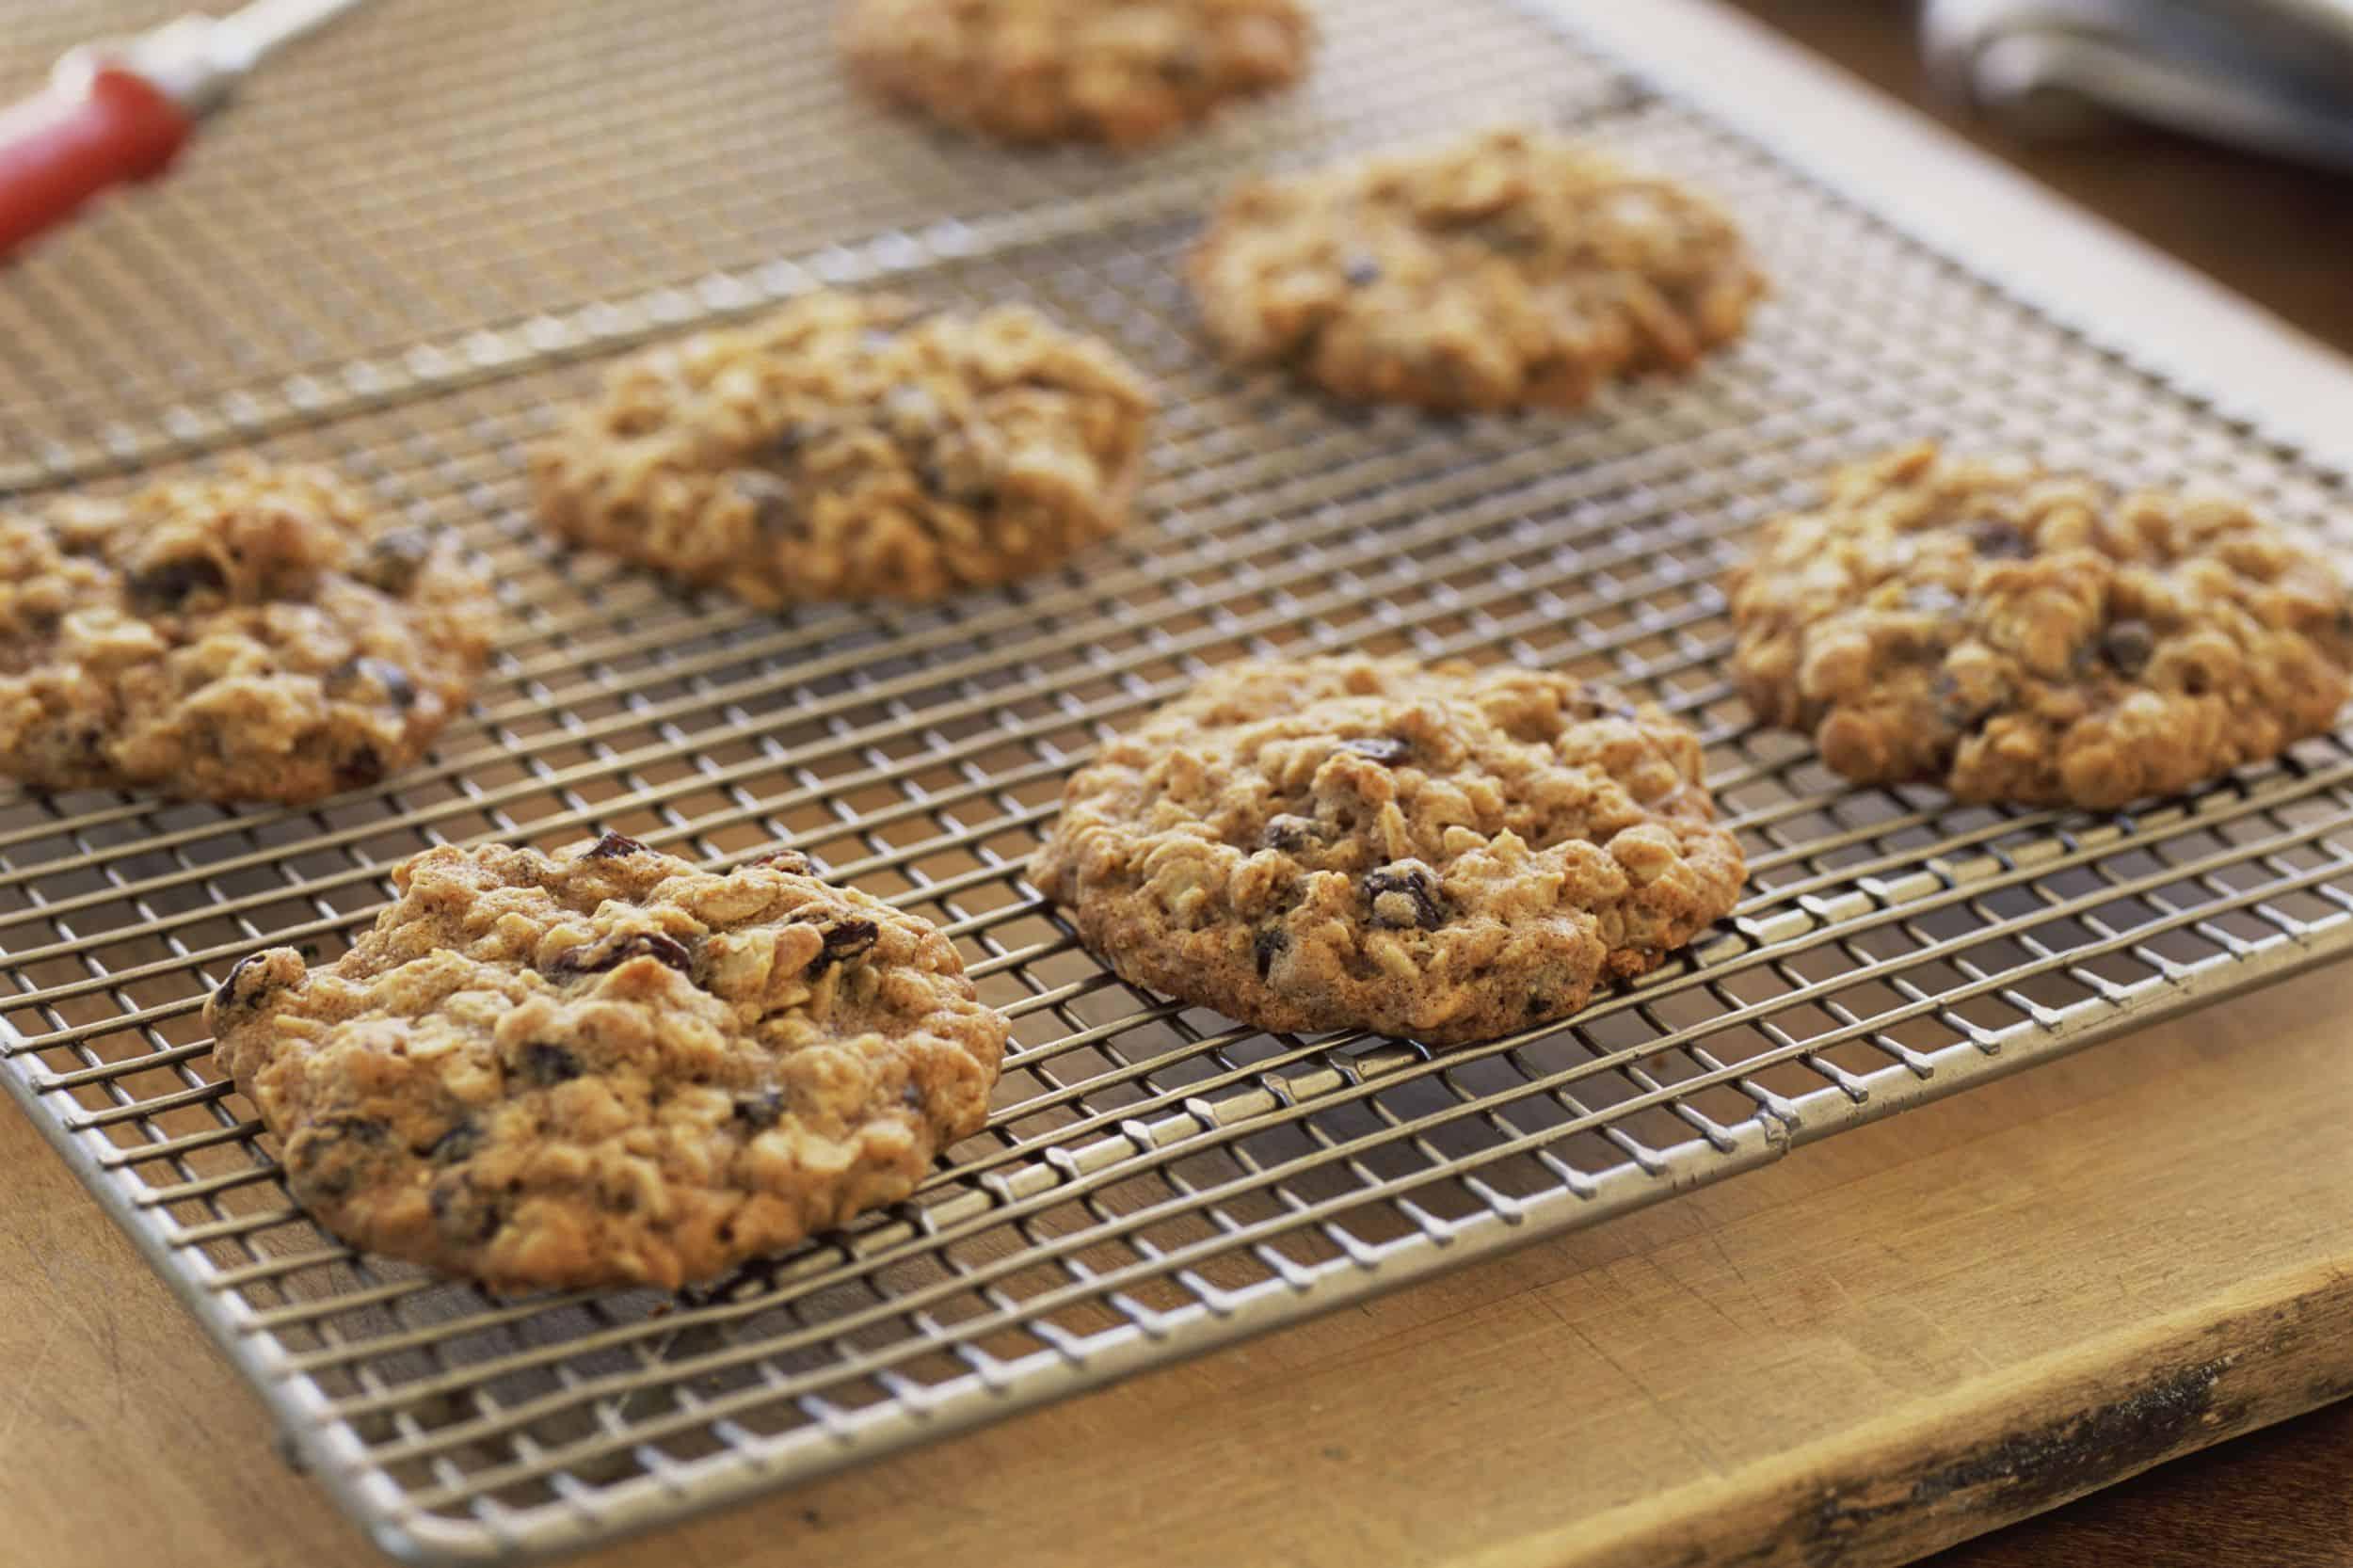 Grandma's old fashioned oatmeal raisin cookies